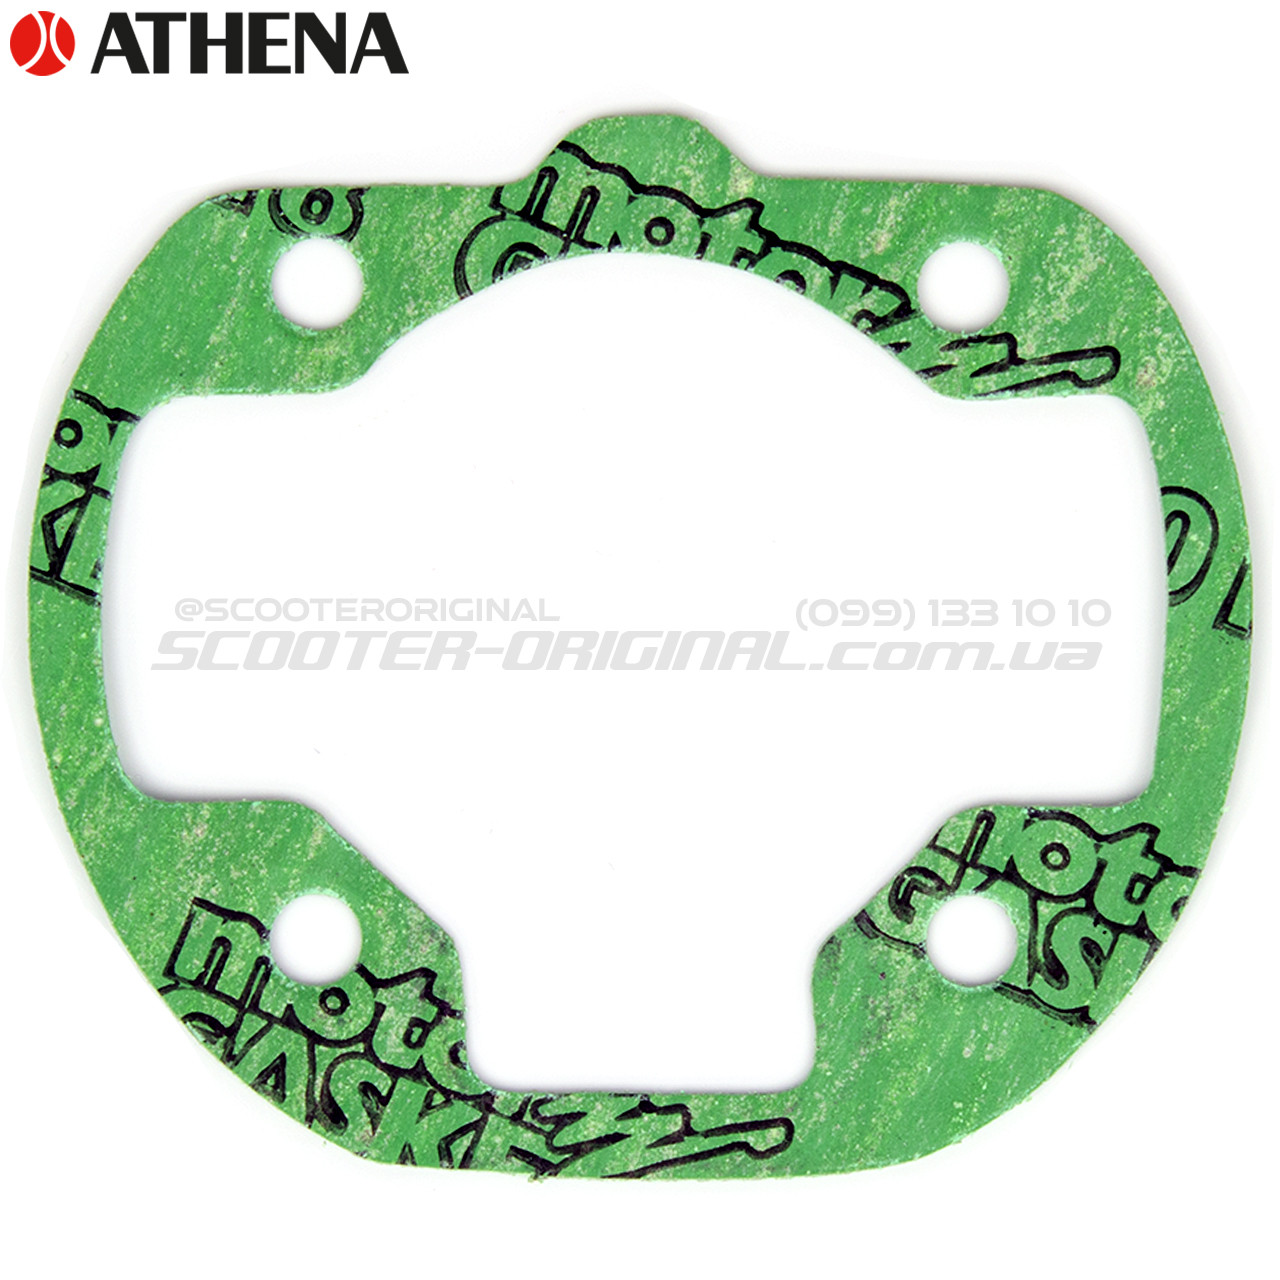 Прокладка под цилиндр ATHENA Minarelli Vertical (Yamaha)